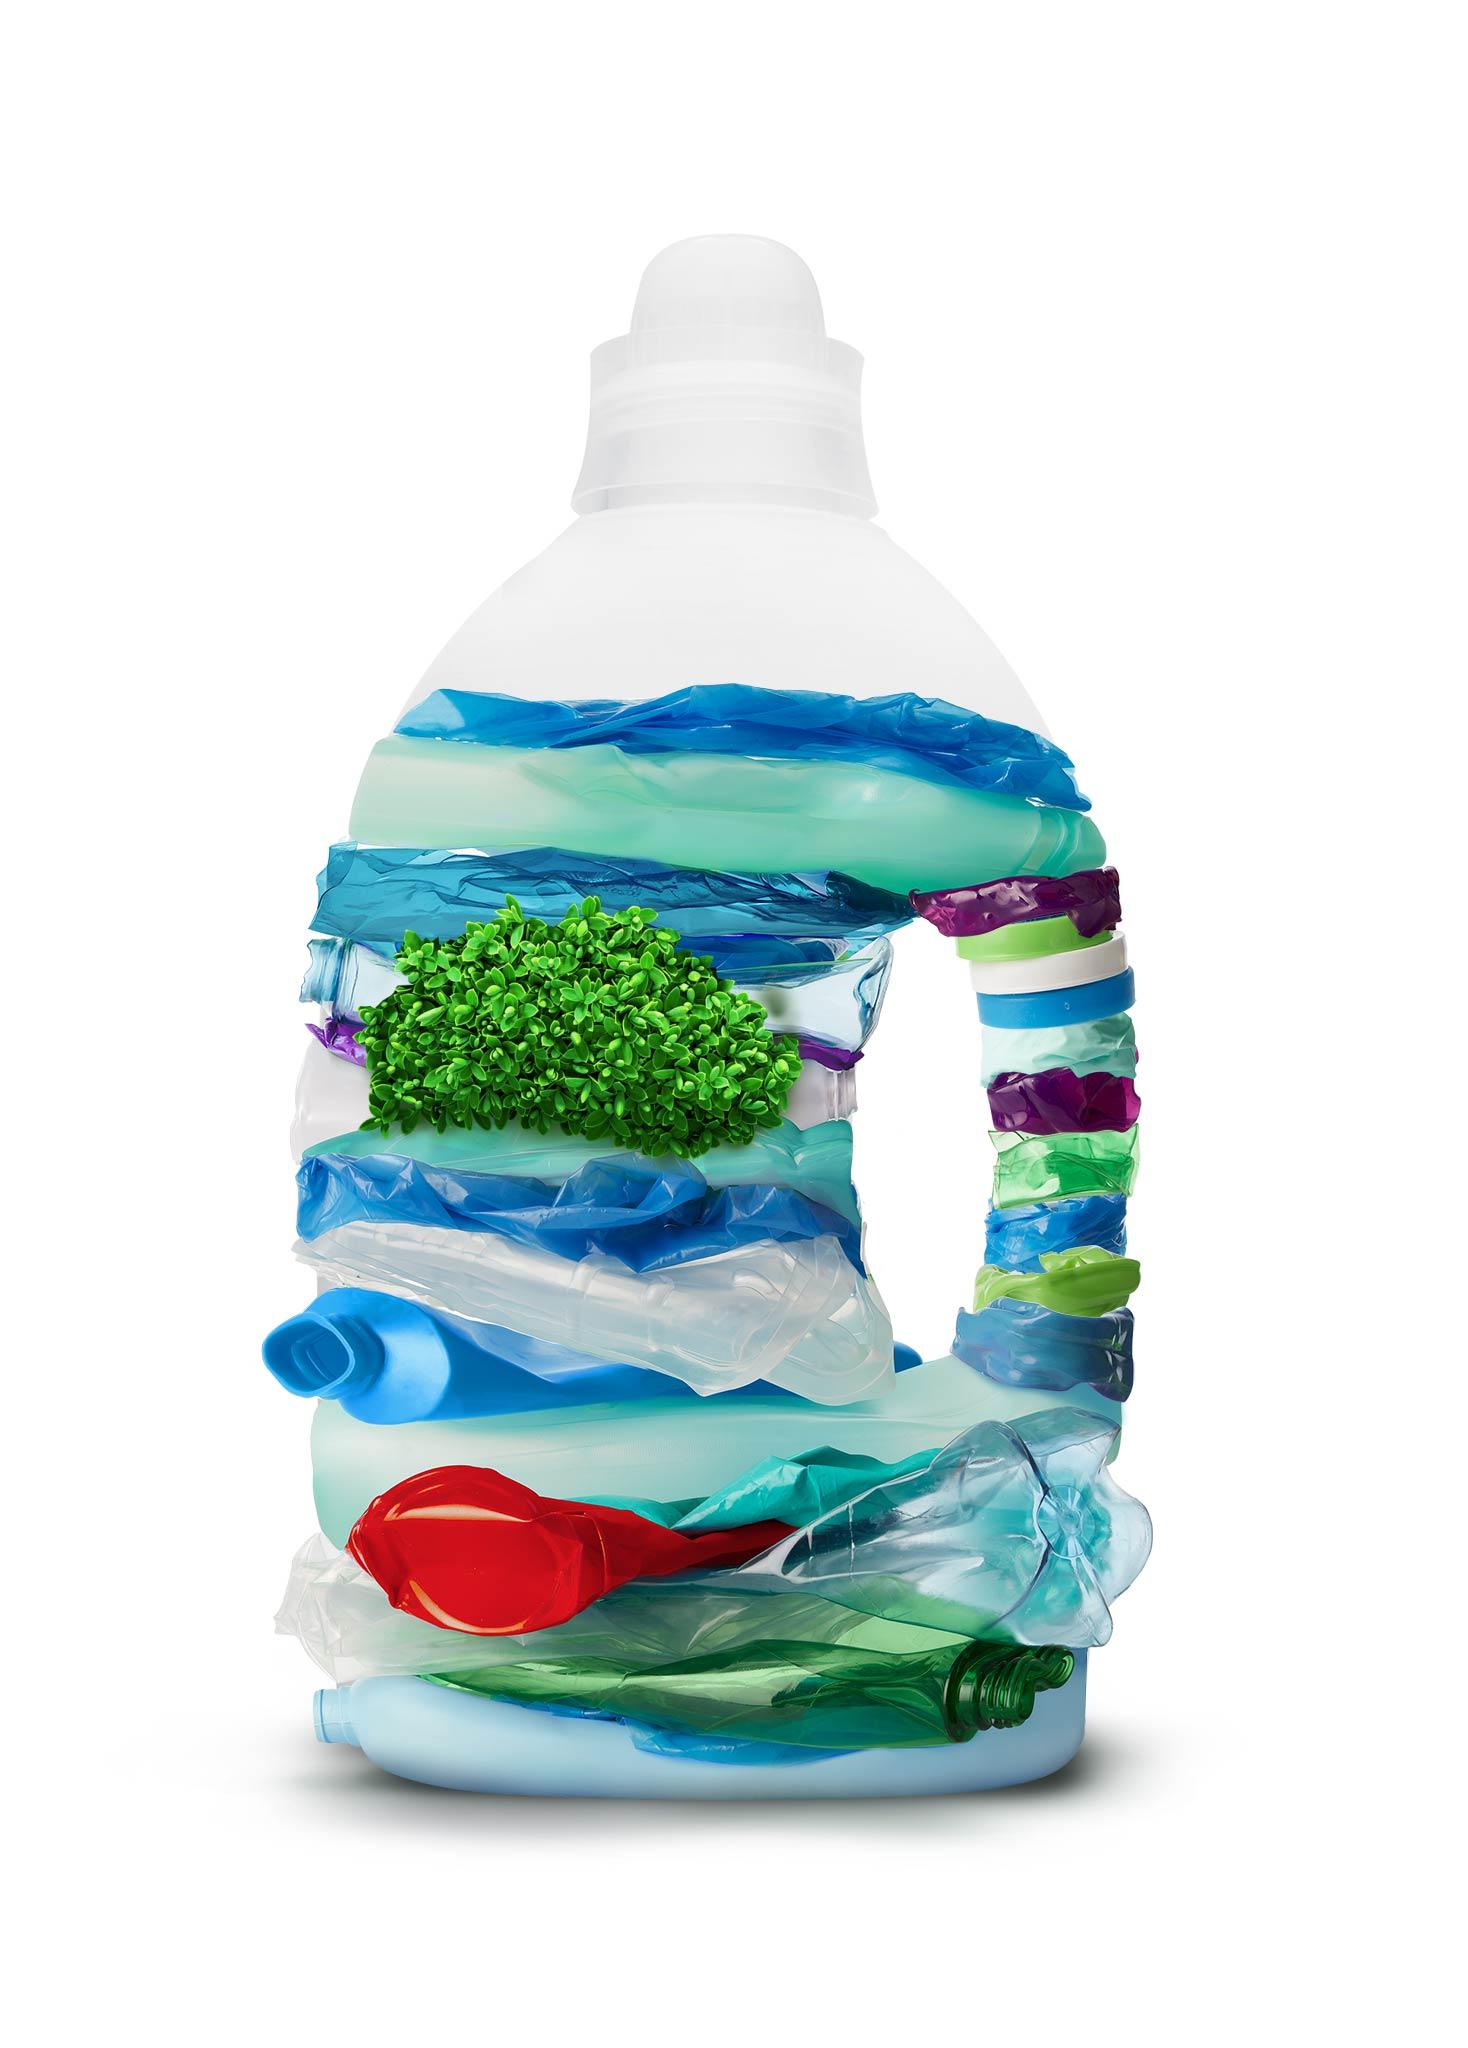 EURO-Laundry_Recycling_07.jpg